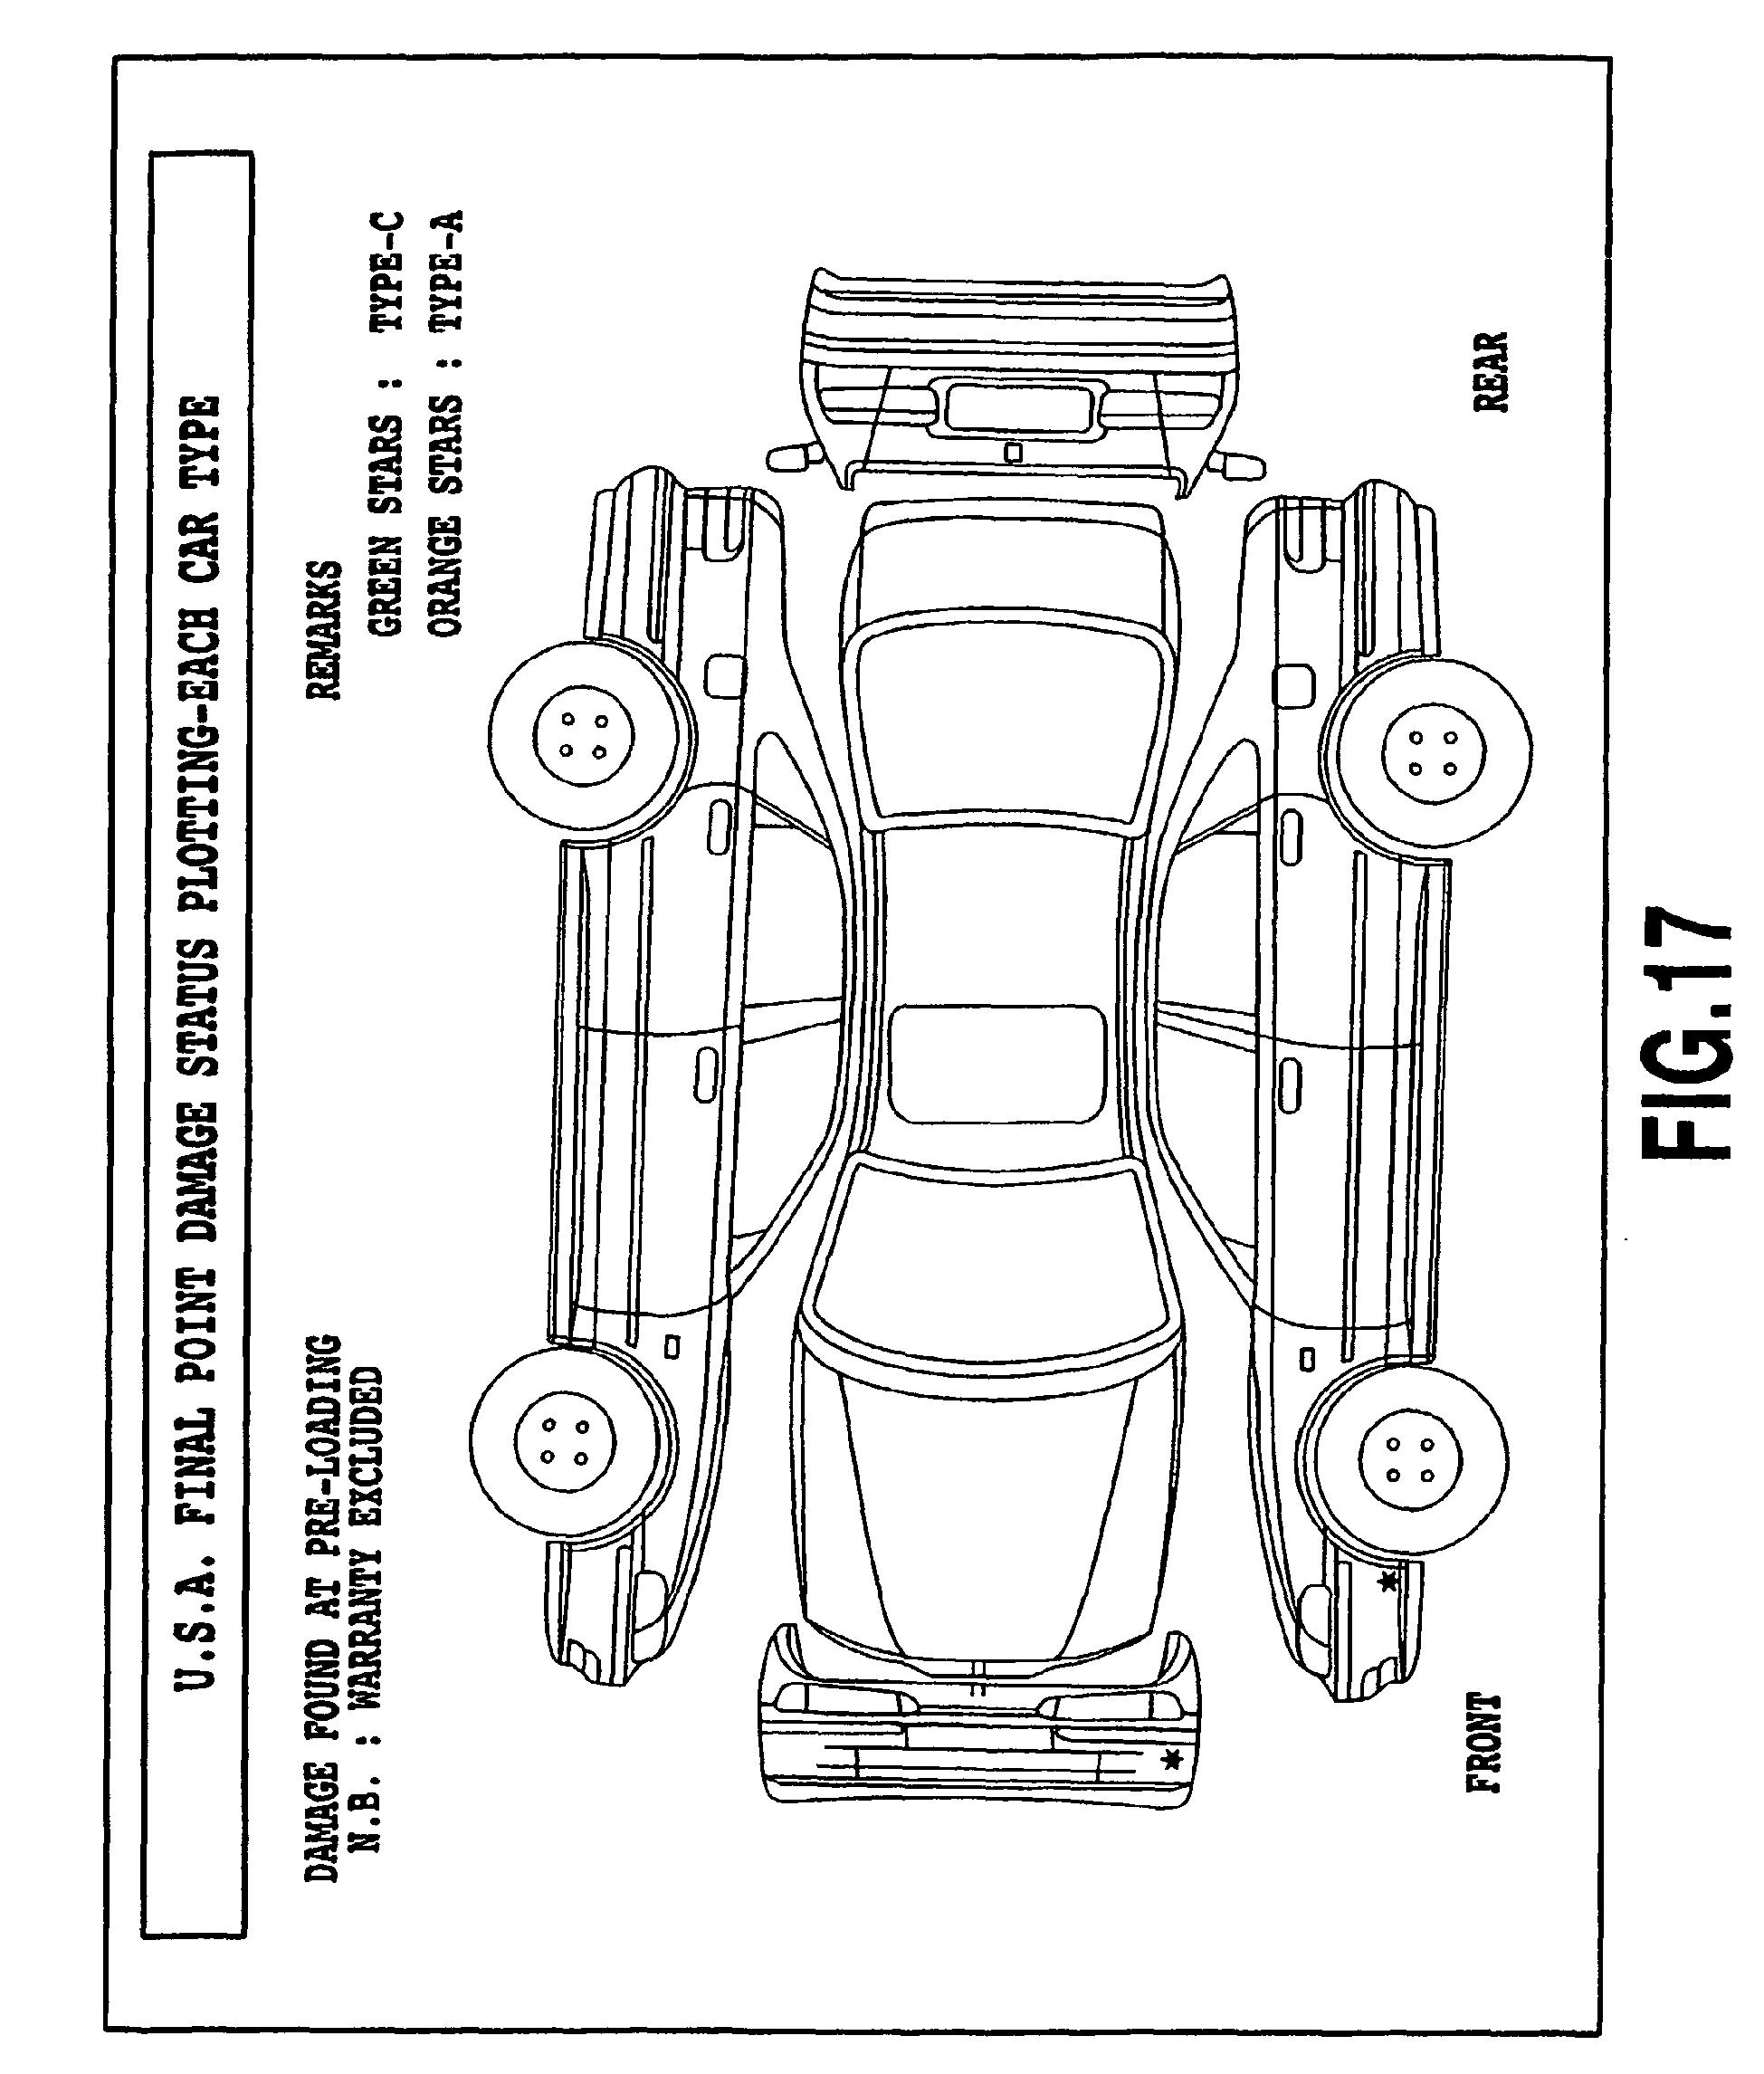 Patent Ep1306322b1